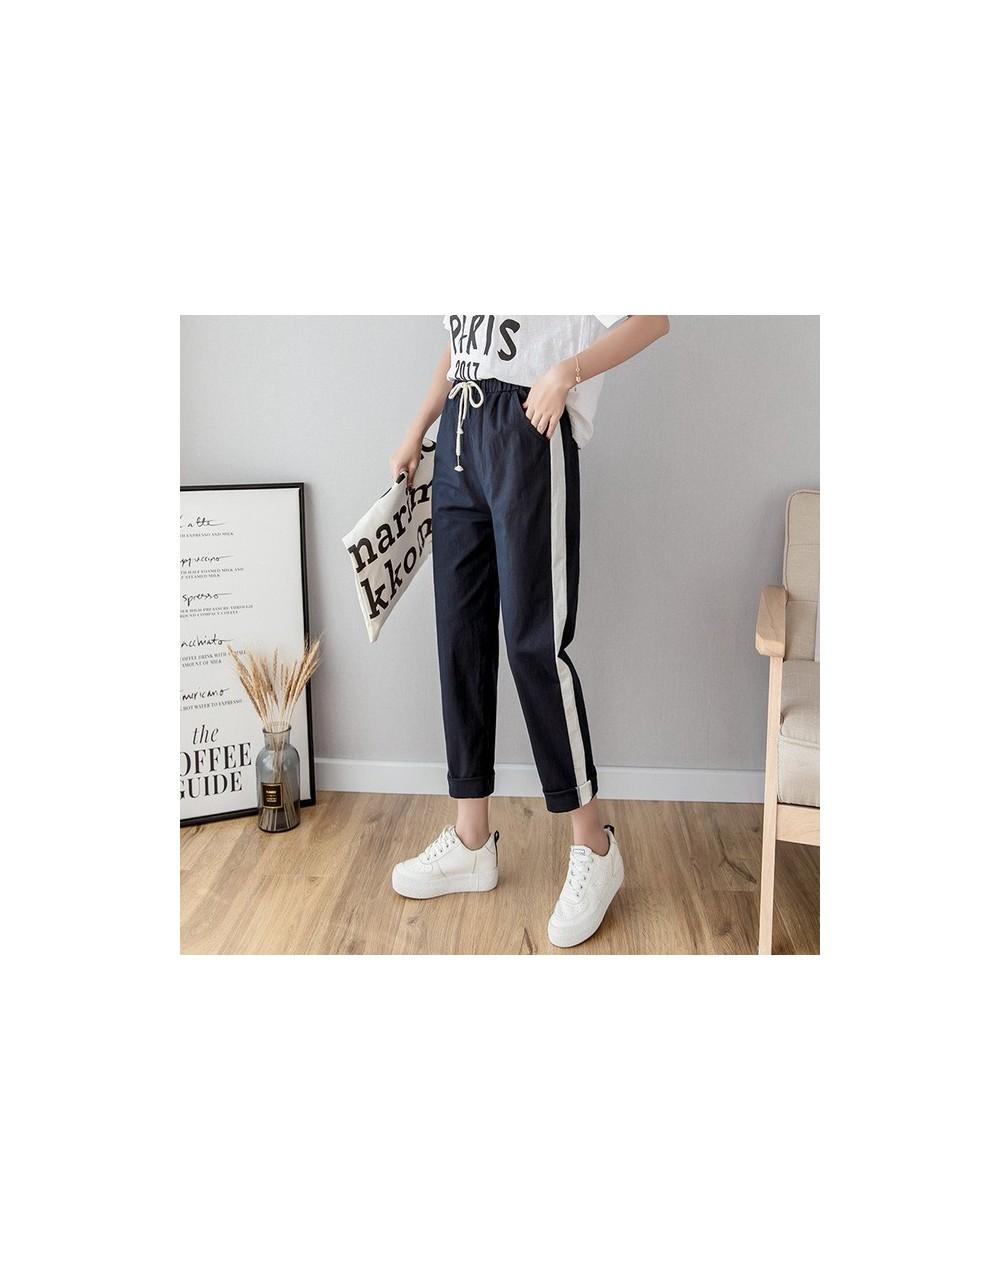 Pencil Casual Women's Pants New Fashion Cotton Linen long Women High Waist Pants Spring Summer Casual Striped Women's Trouse...